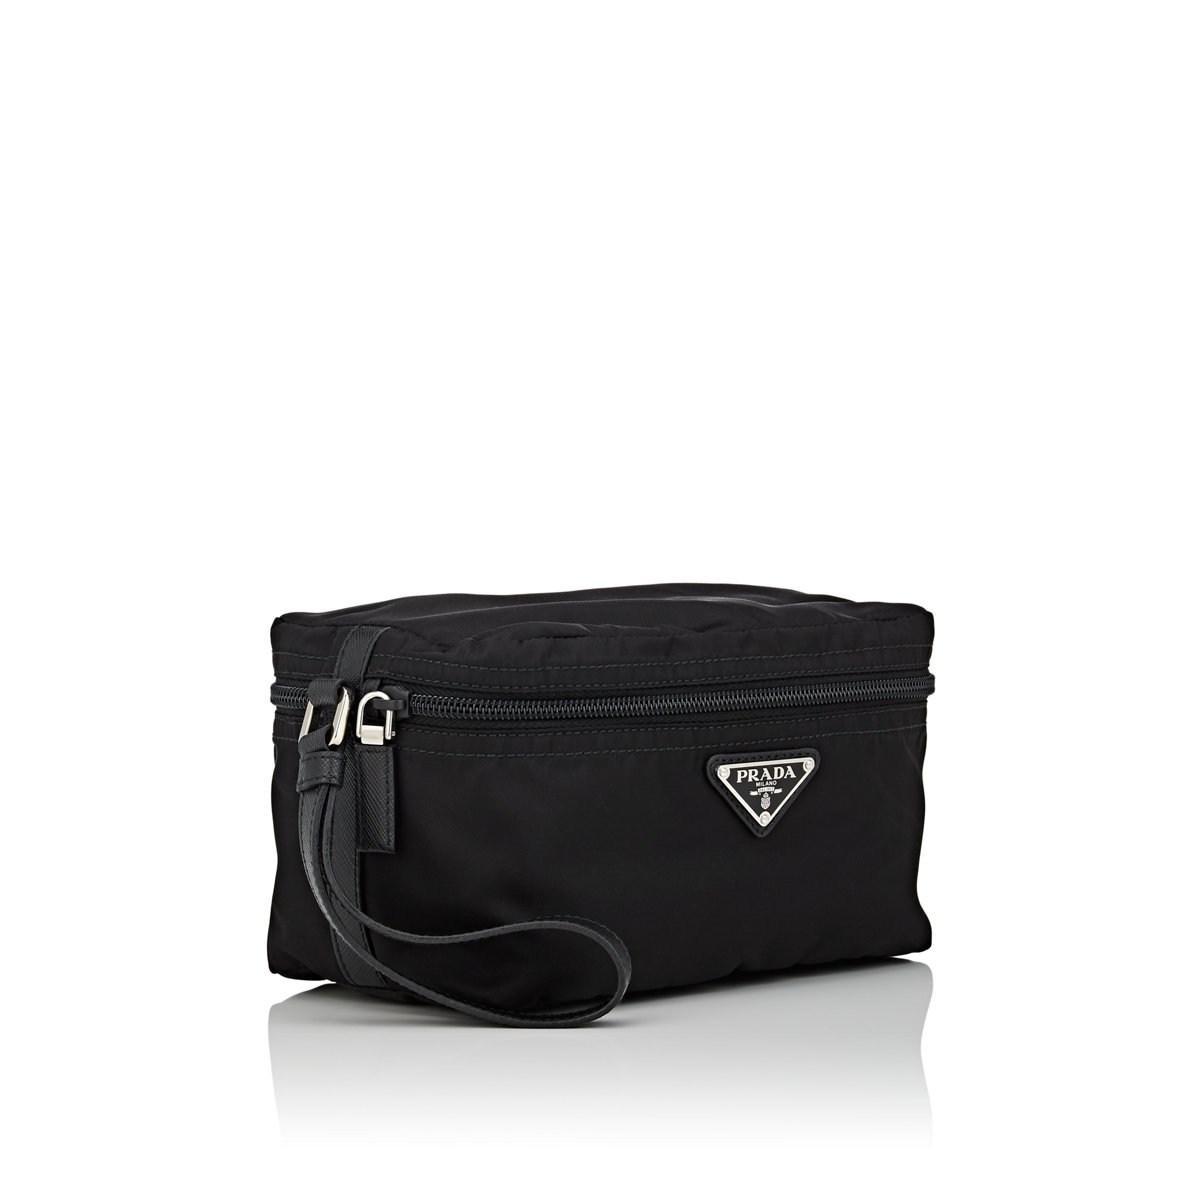 076e51a7223ecd Prada - Black Leather-trimmed Organizer Case for Men - Lyst. View fullscreen